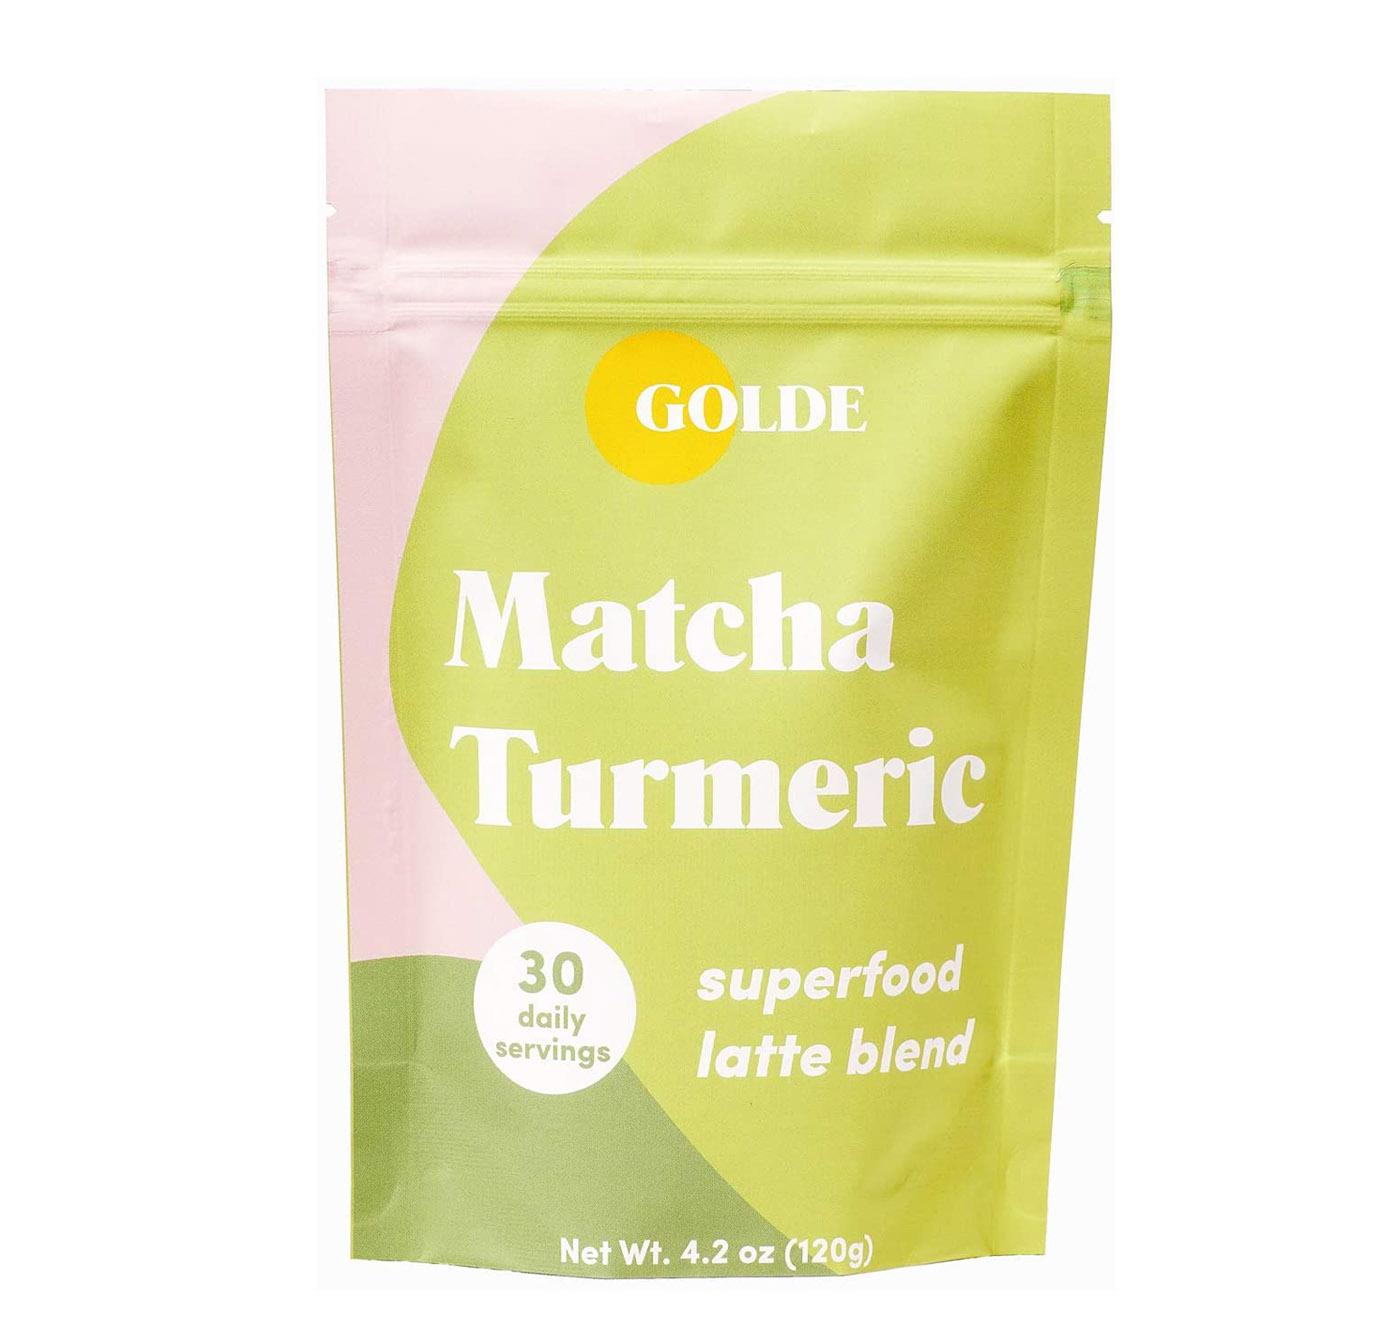 golde matcha turmeric latte